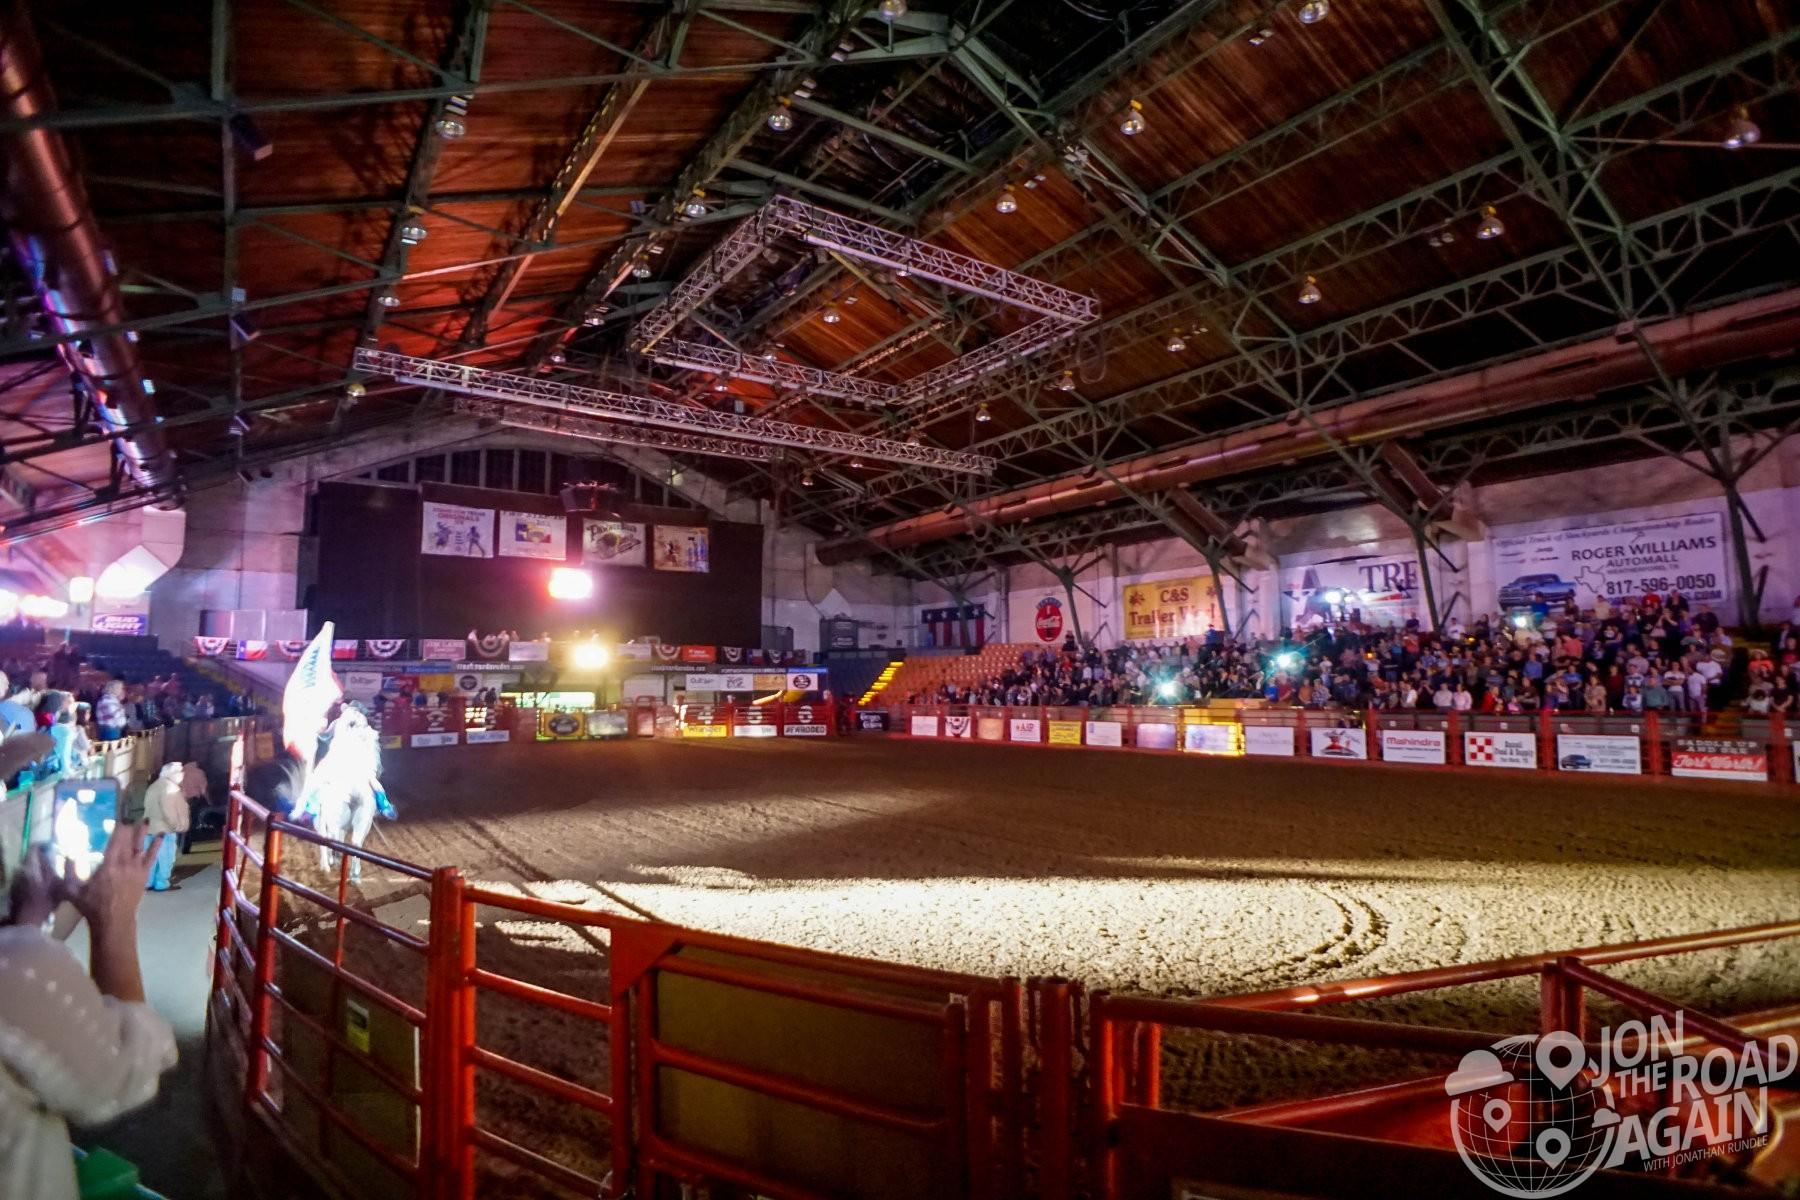 Inside the Cowtown Coliseum